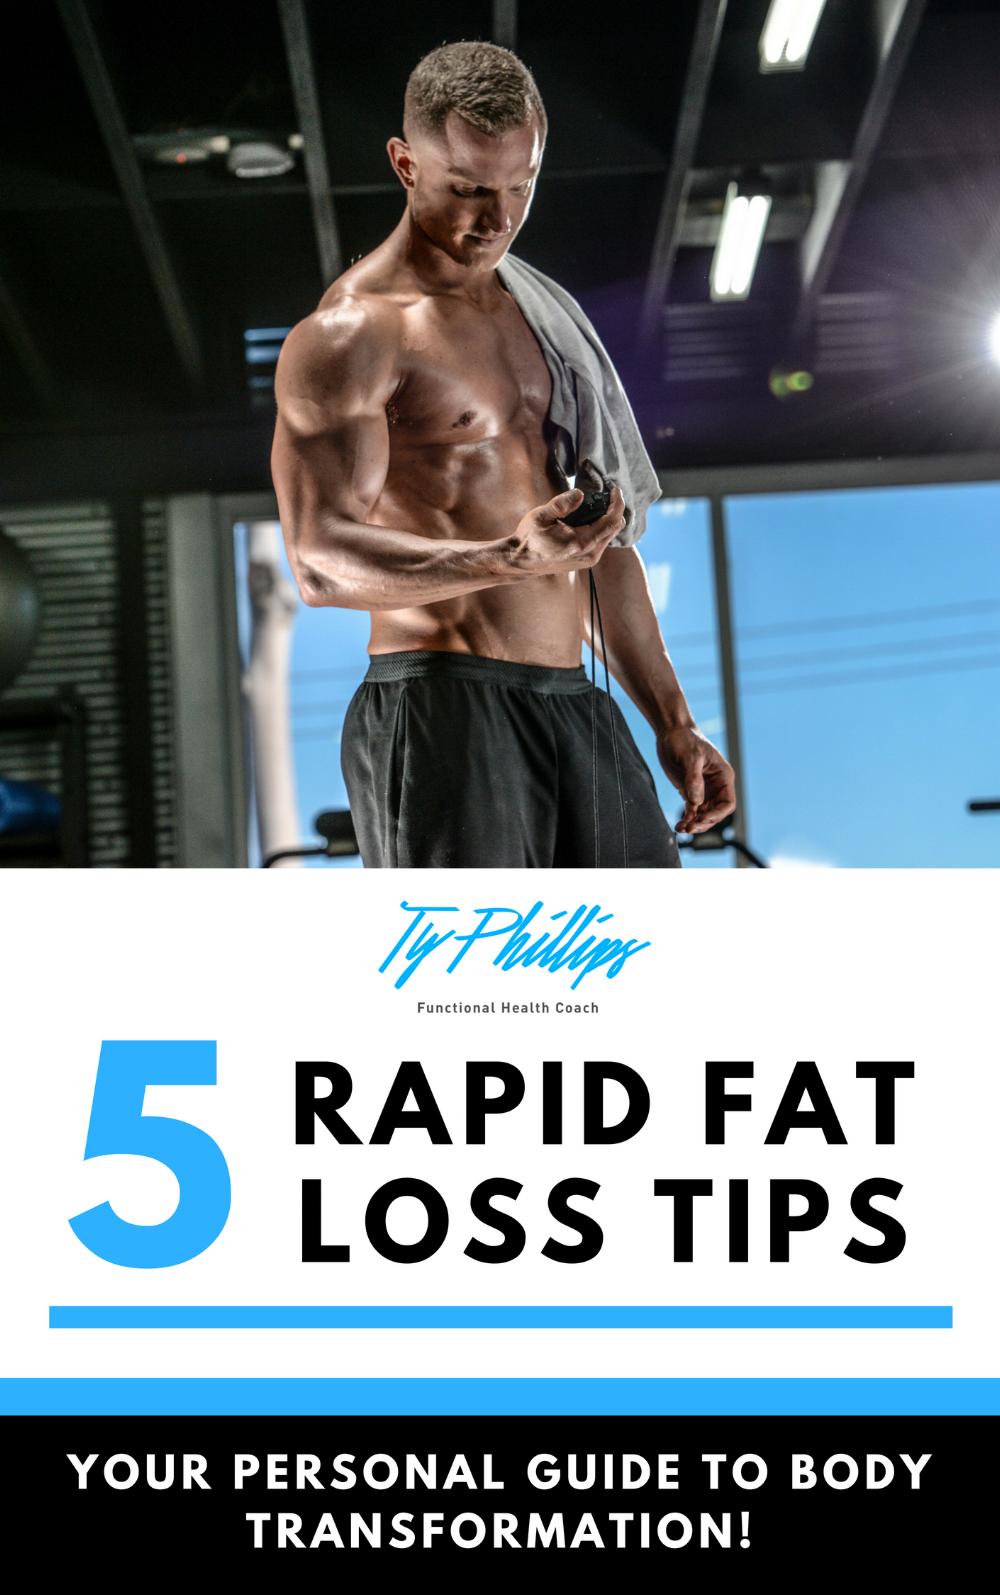 Free Rapid Fat Loss Tips Ebook